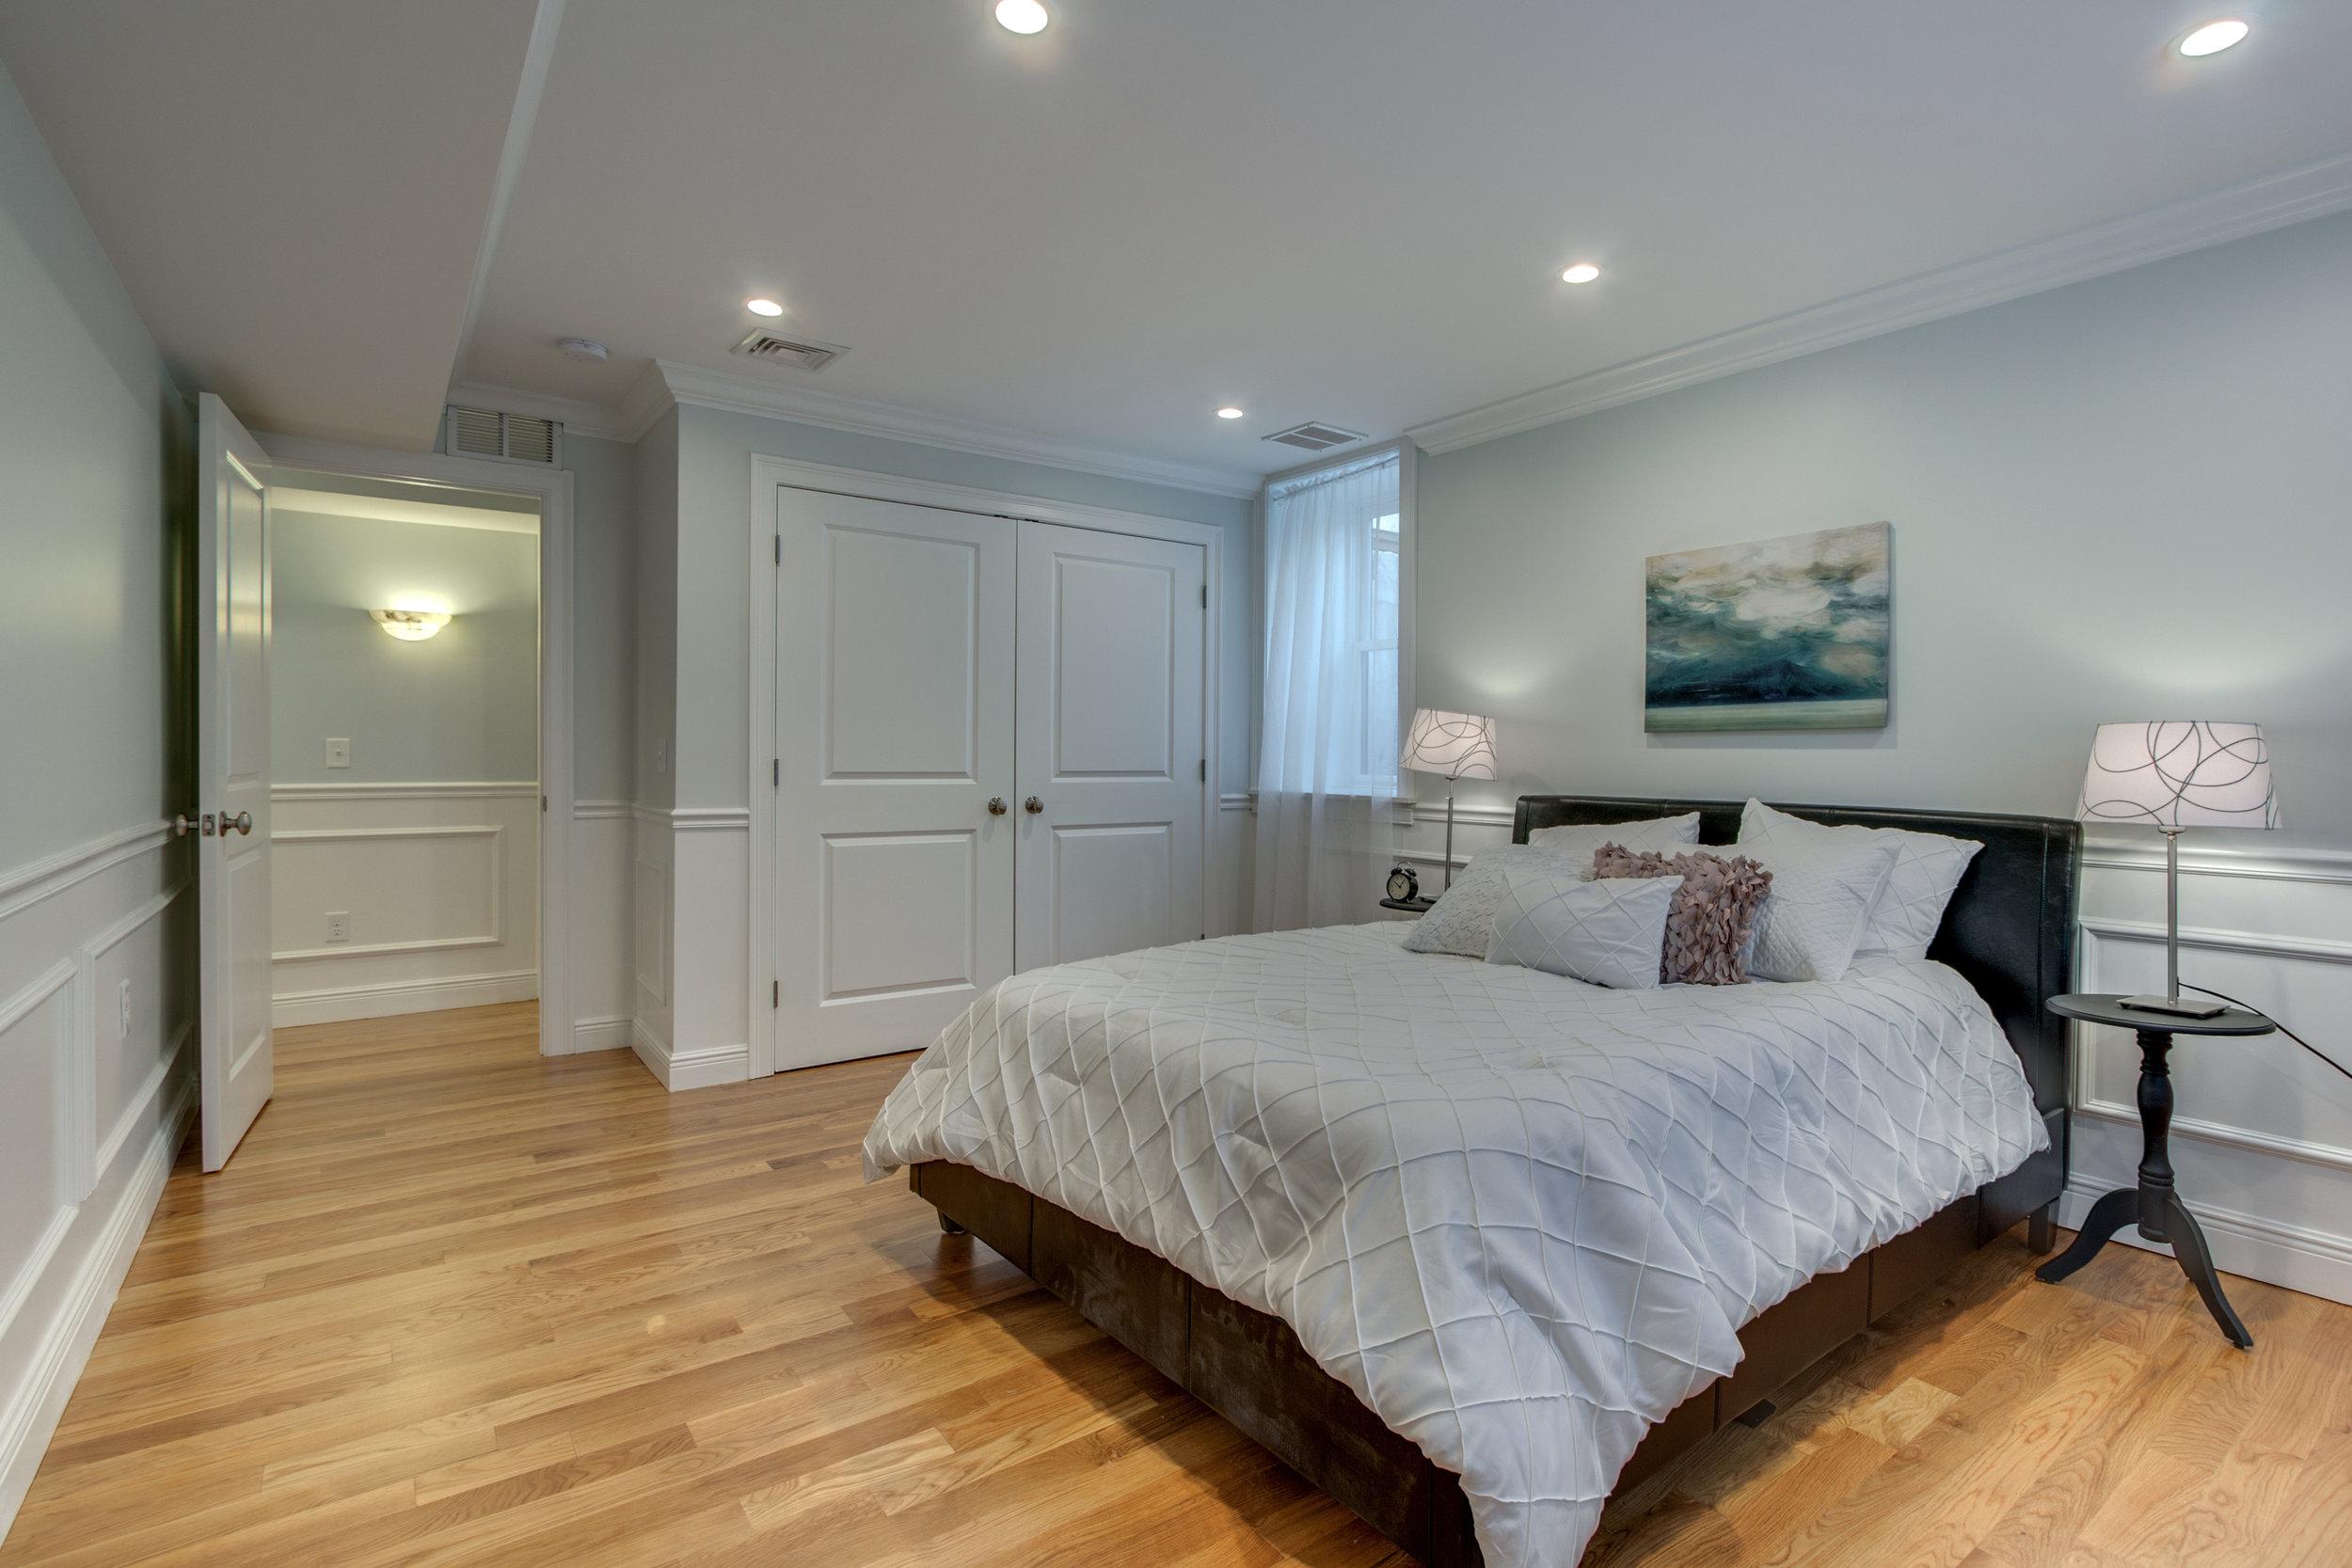 28_Bedroom3-2.jpg